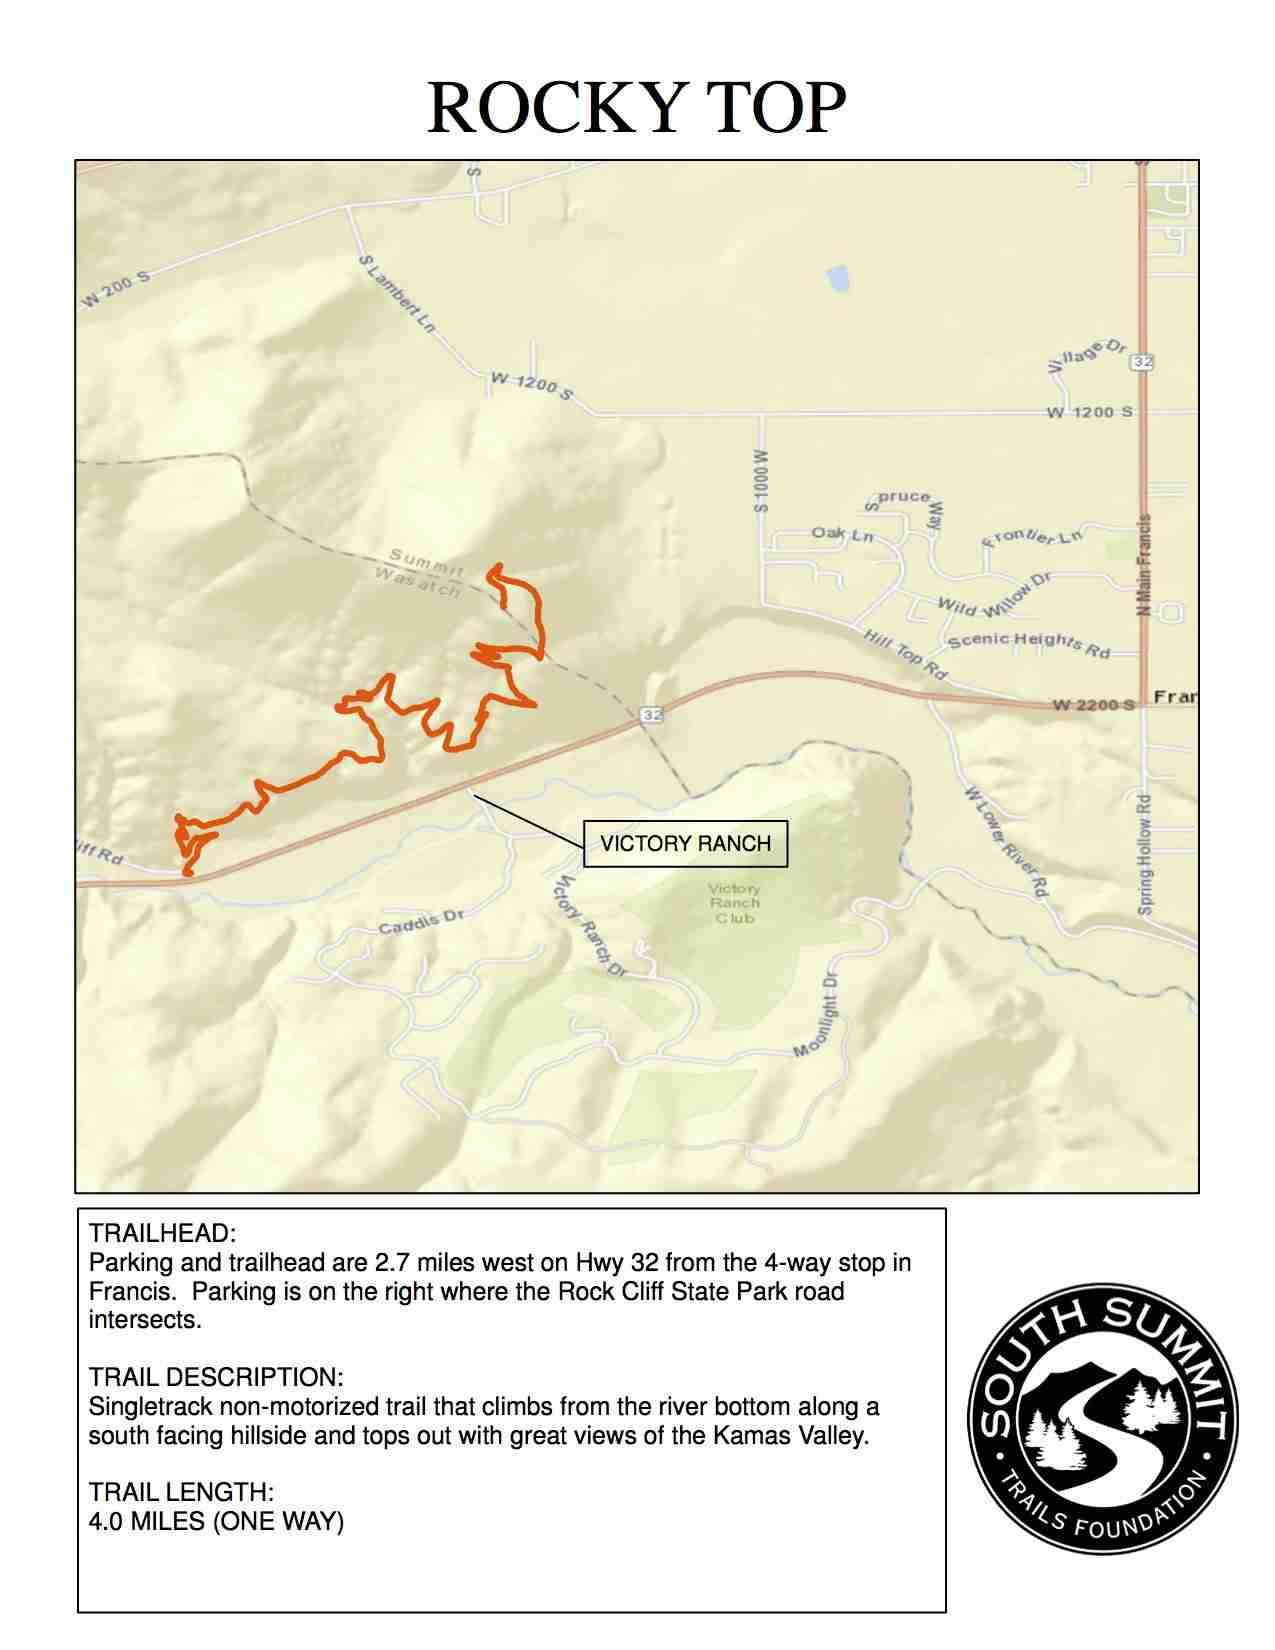 Maps - South Summit Trails Foundation Hillside Trail Map on brookfield trail map, itasca trail map, matteson trail map, oak forest trail map, riverdale trail map, lincoln park trail map, kirkland trail map, temelpa trail map, deerfield trail map, berkeley trail map, florence trail map, plainfield trail map, barnegat trail map, highland trail map, garfield trail map, crystal lake trail map, glenwood trail map, cook county trail map, palos hills trail map, jefferson trail map,